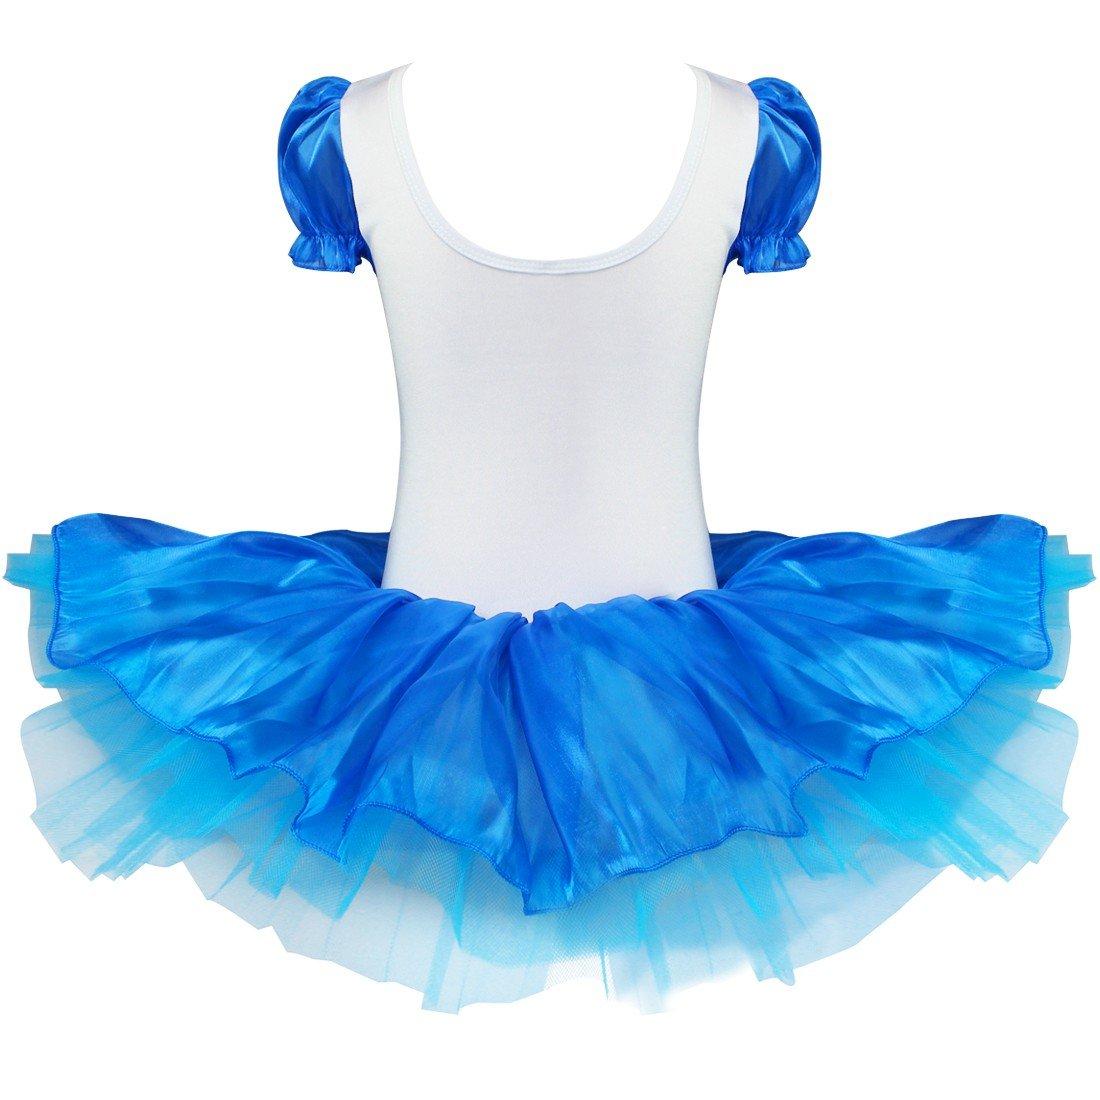 TiaoBug Girls Kids Gymnastics Dance Tutu Dress Ballet Leotard Skirt Dancewear Costume